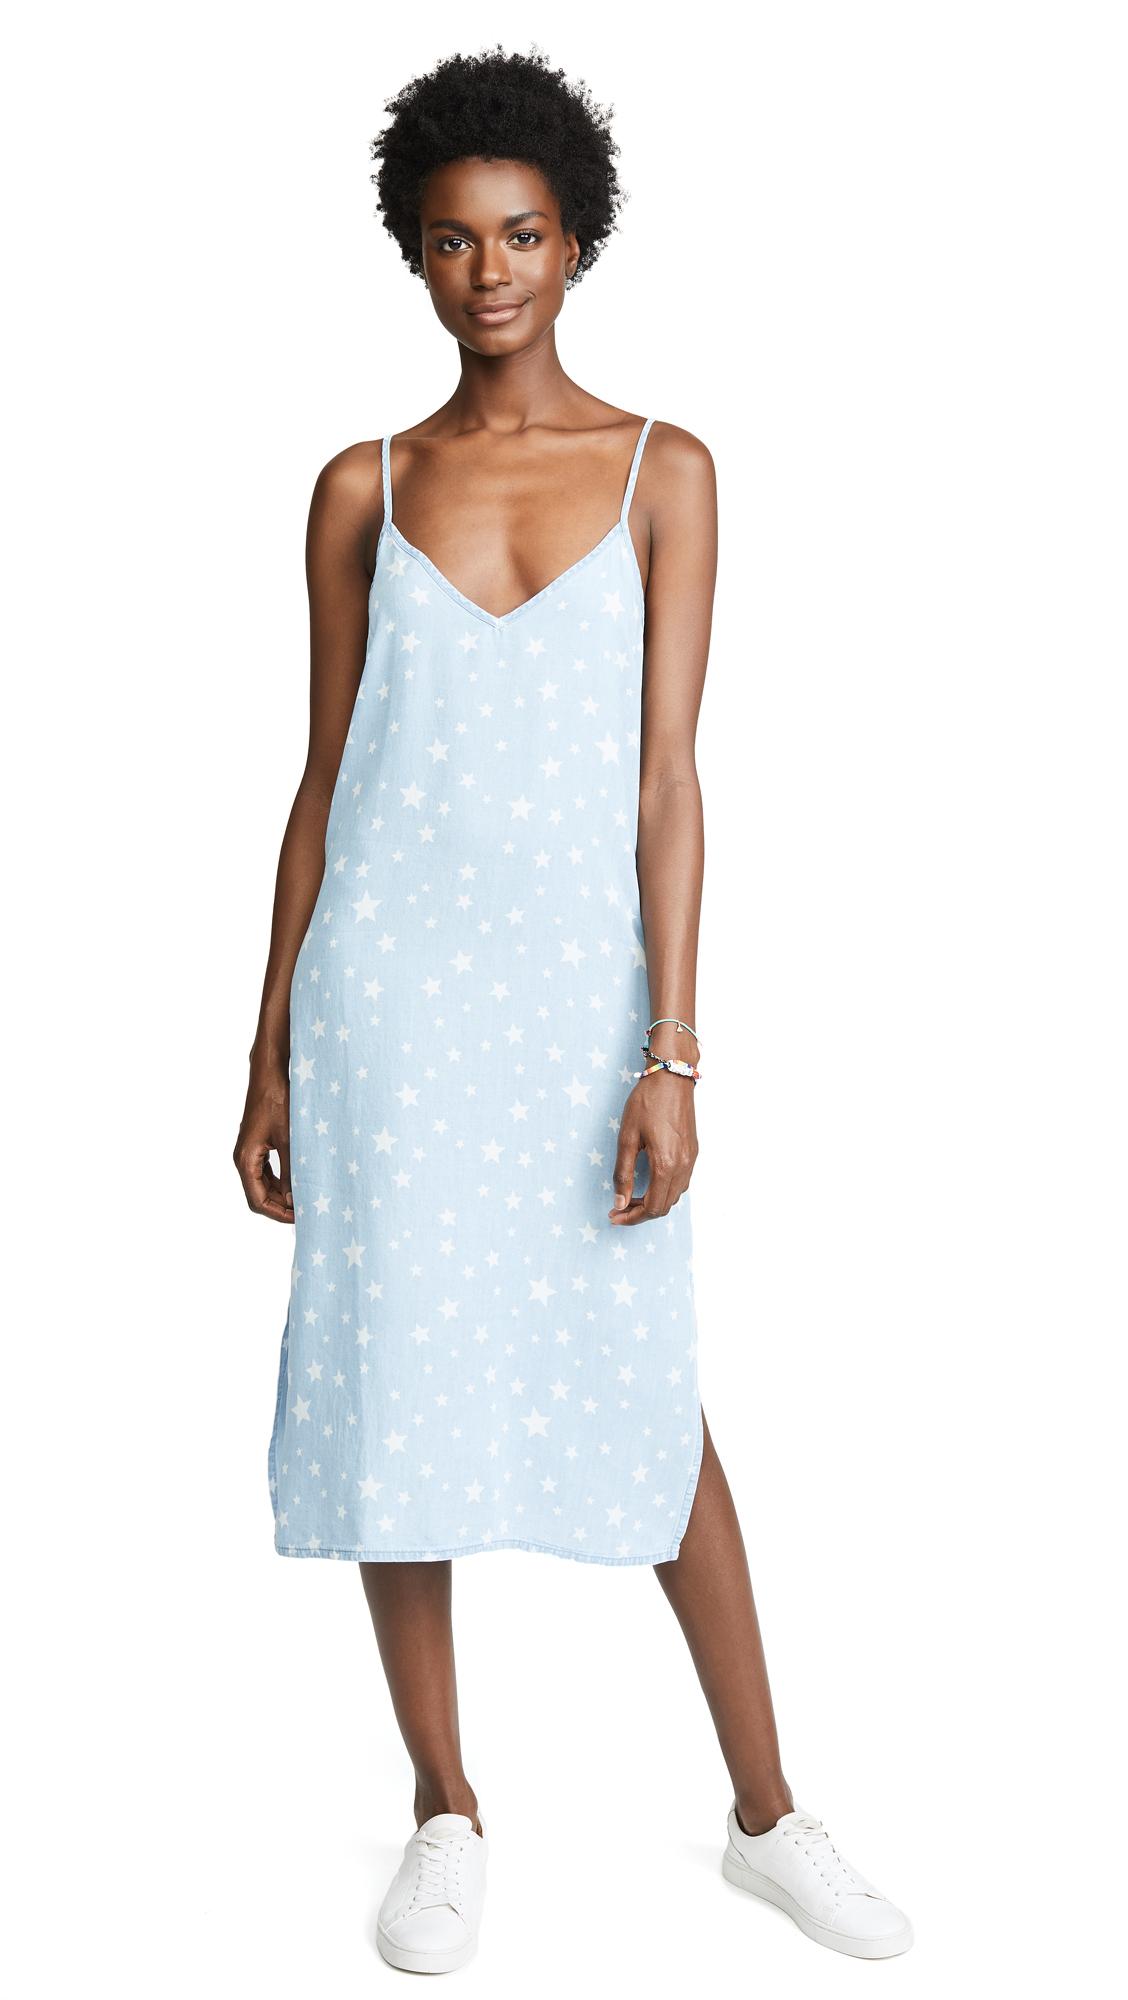 Splendid Americana Slip Dress - Light Wash